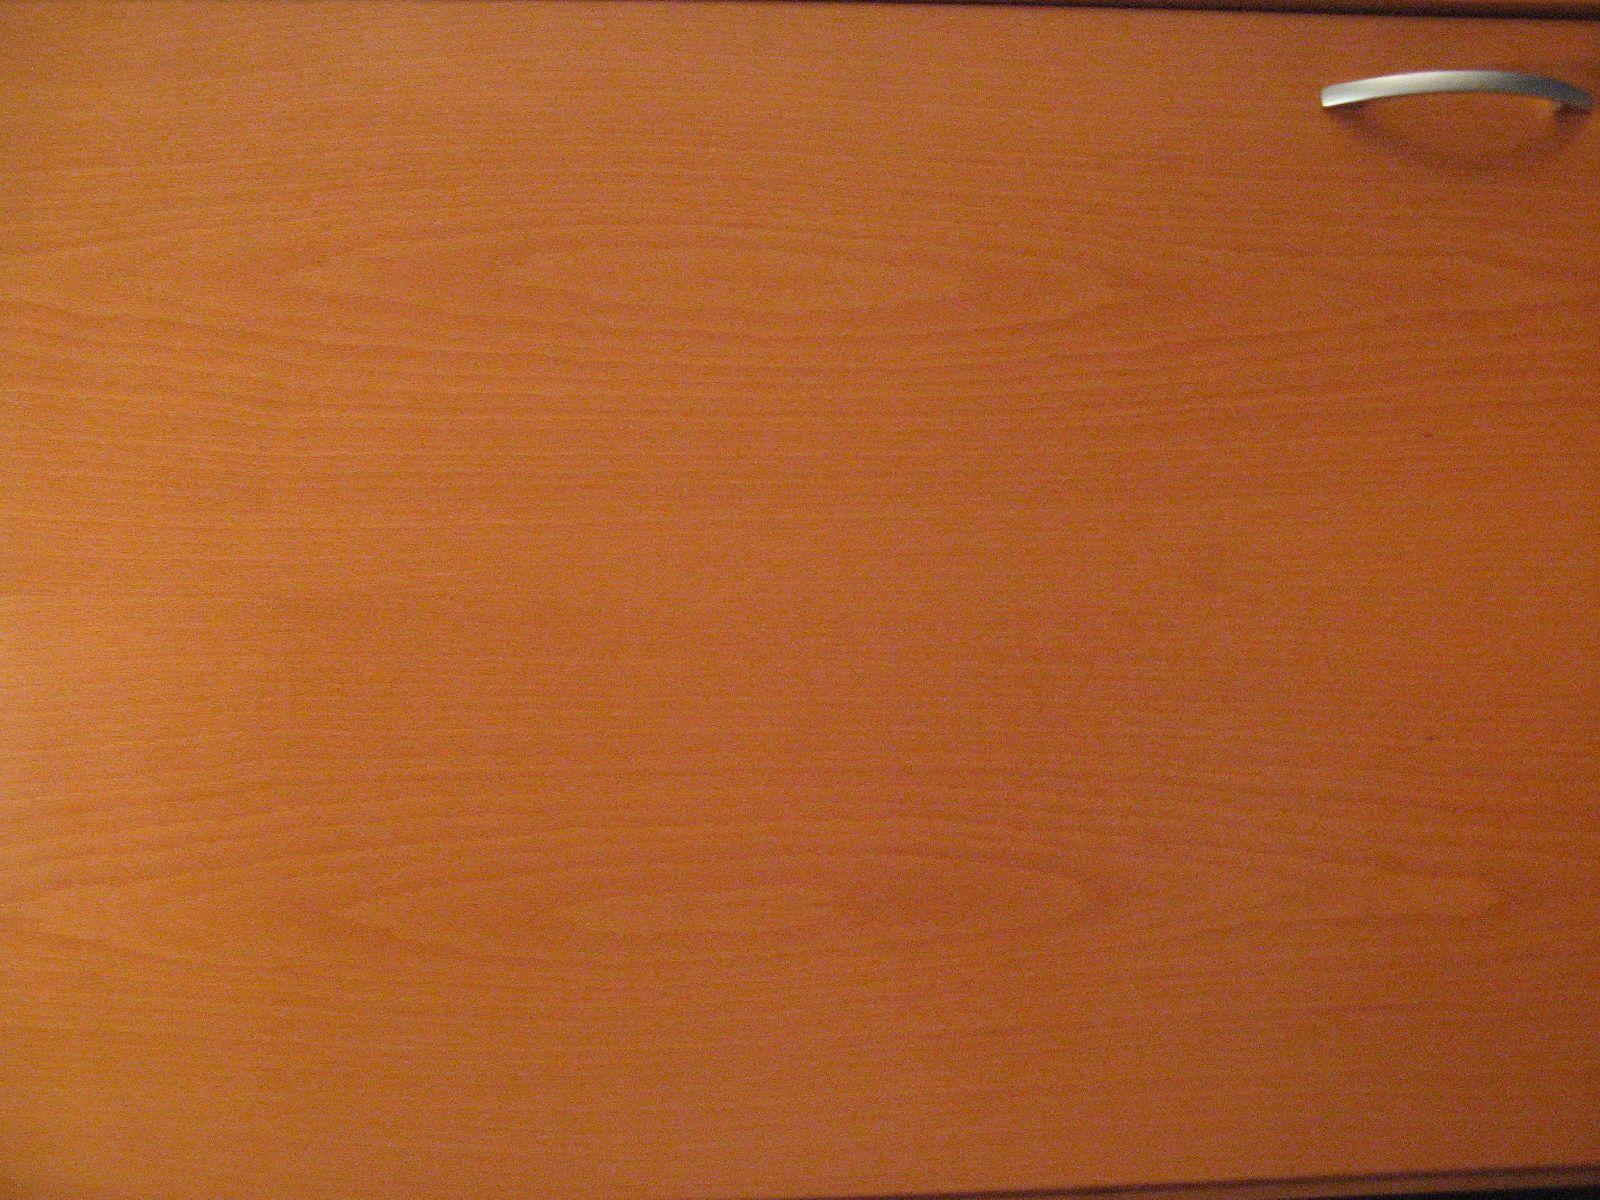 Wood_Textures_B_3556